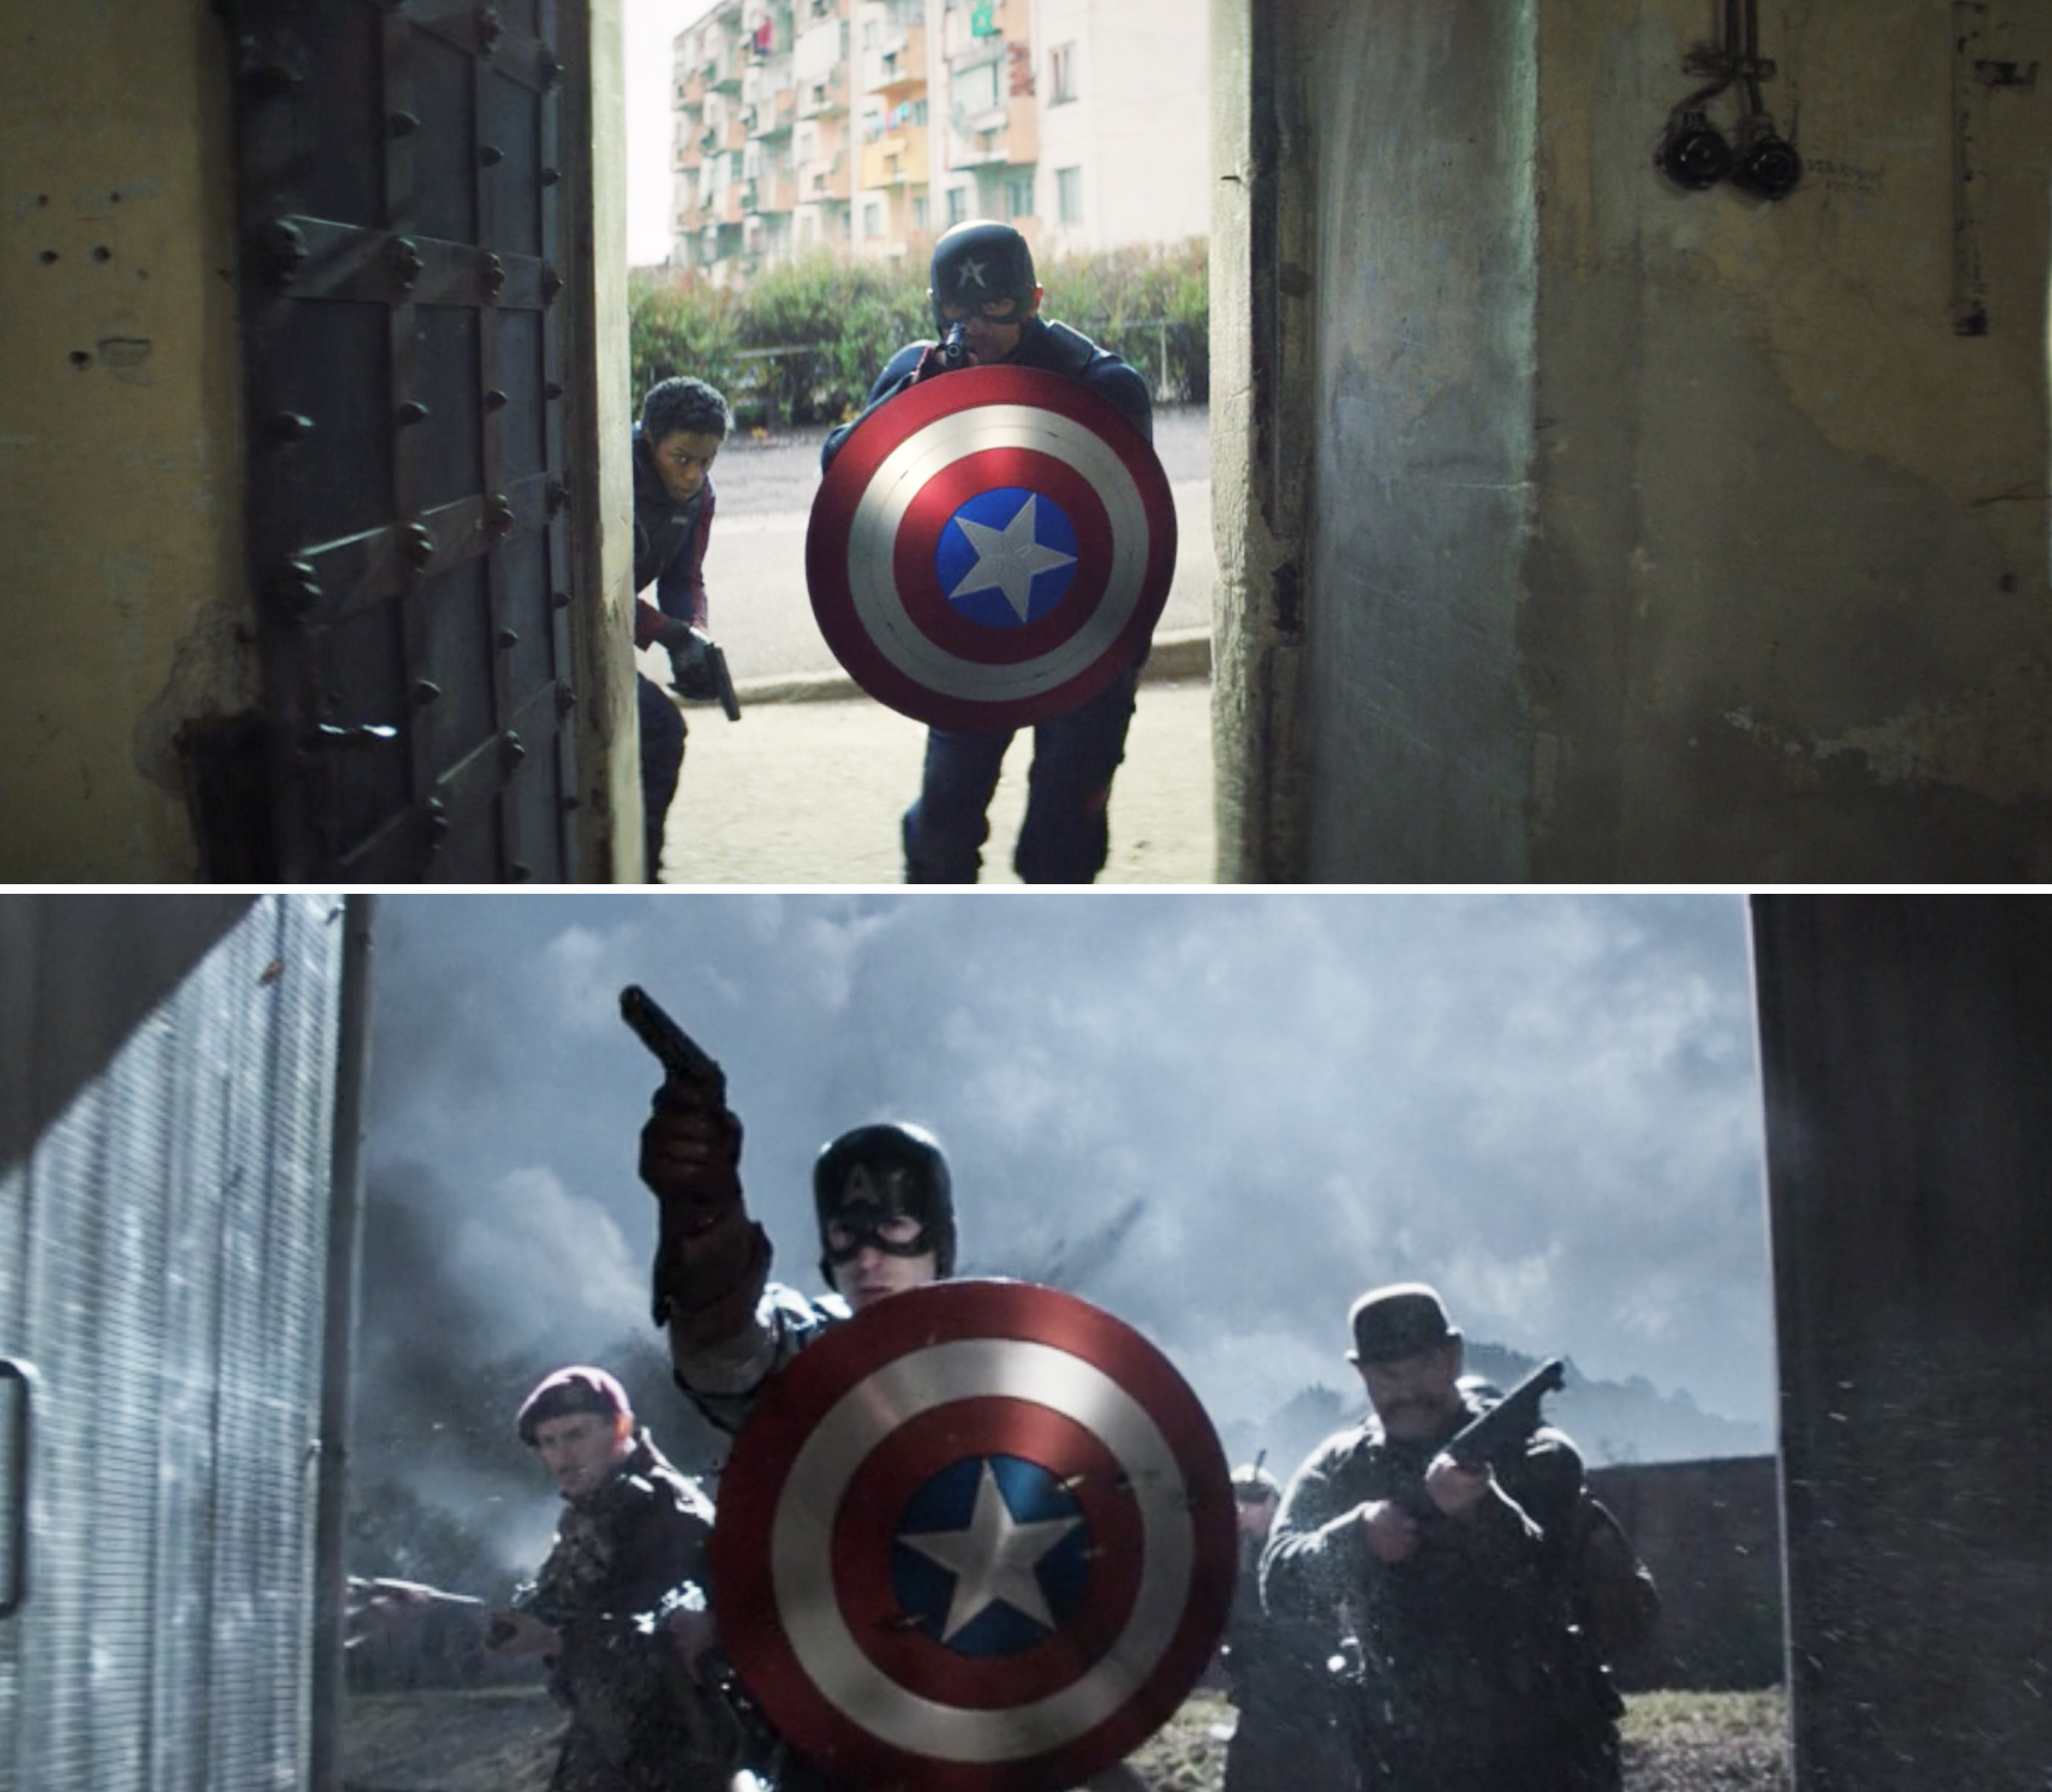 Walker hiding behind the shield vs. Steve hiding behind the shield